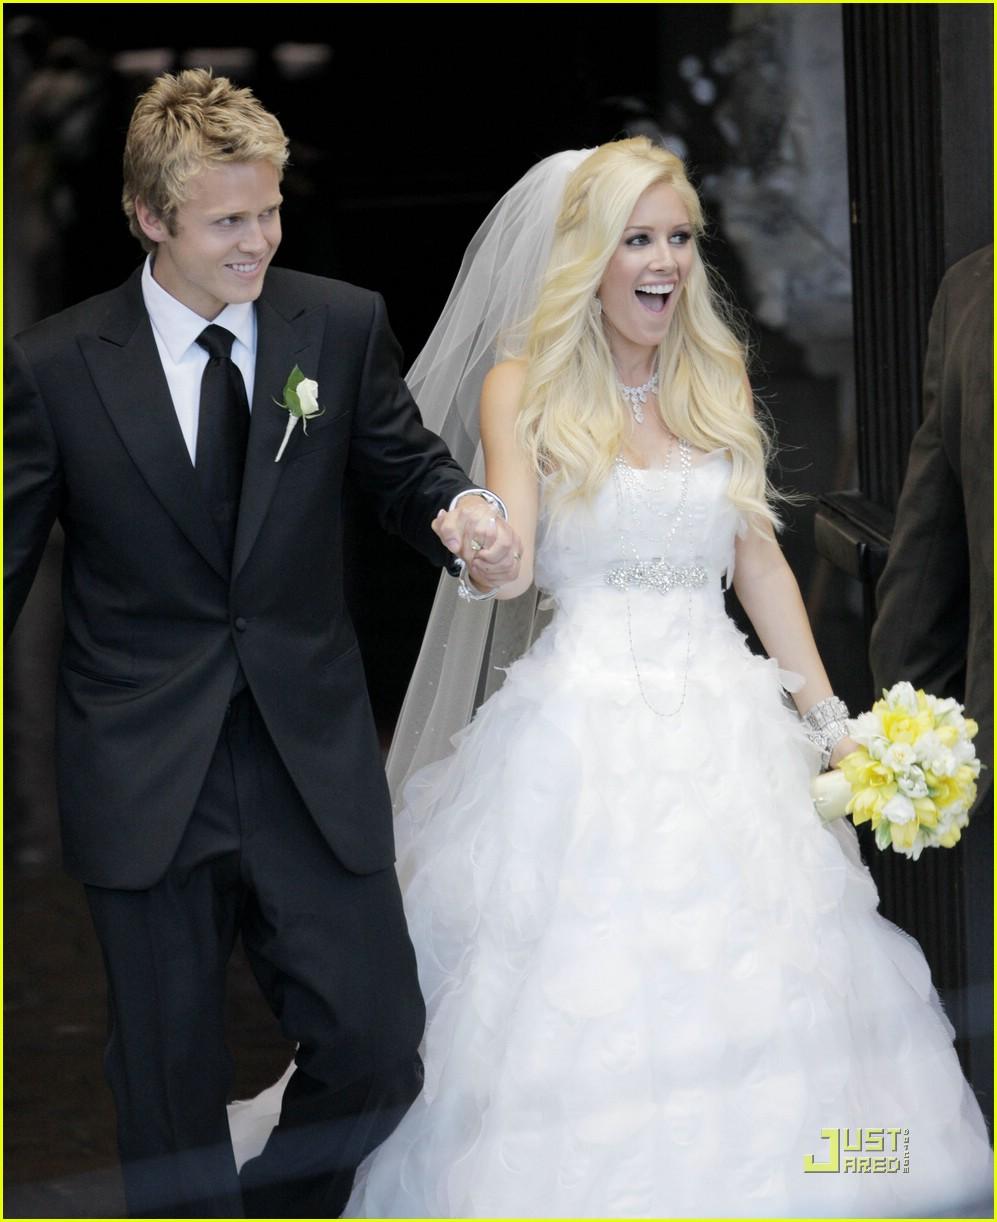 Heidi & Spencer Wedding Pictures Photo 15